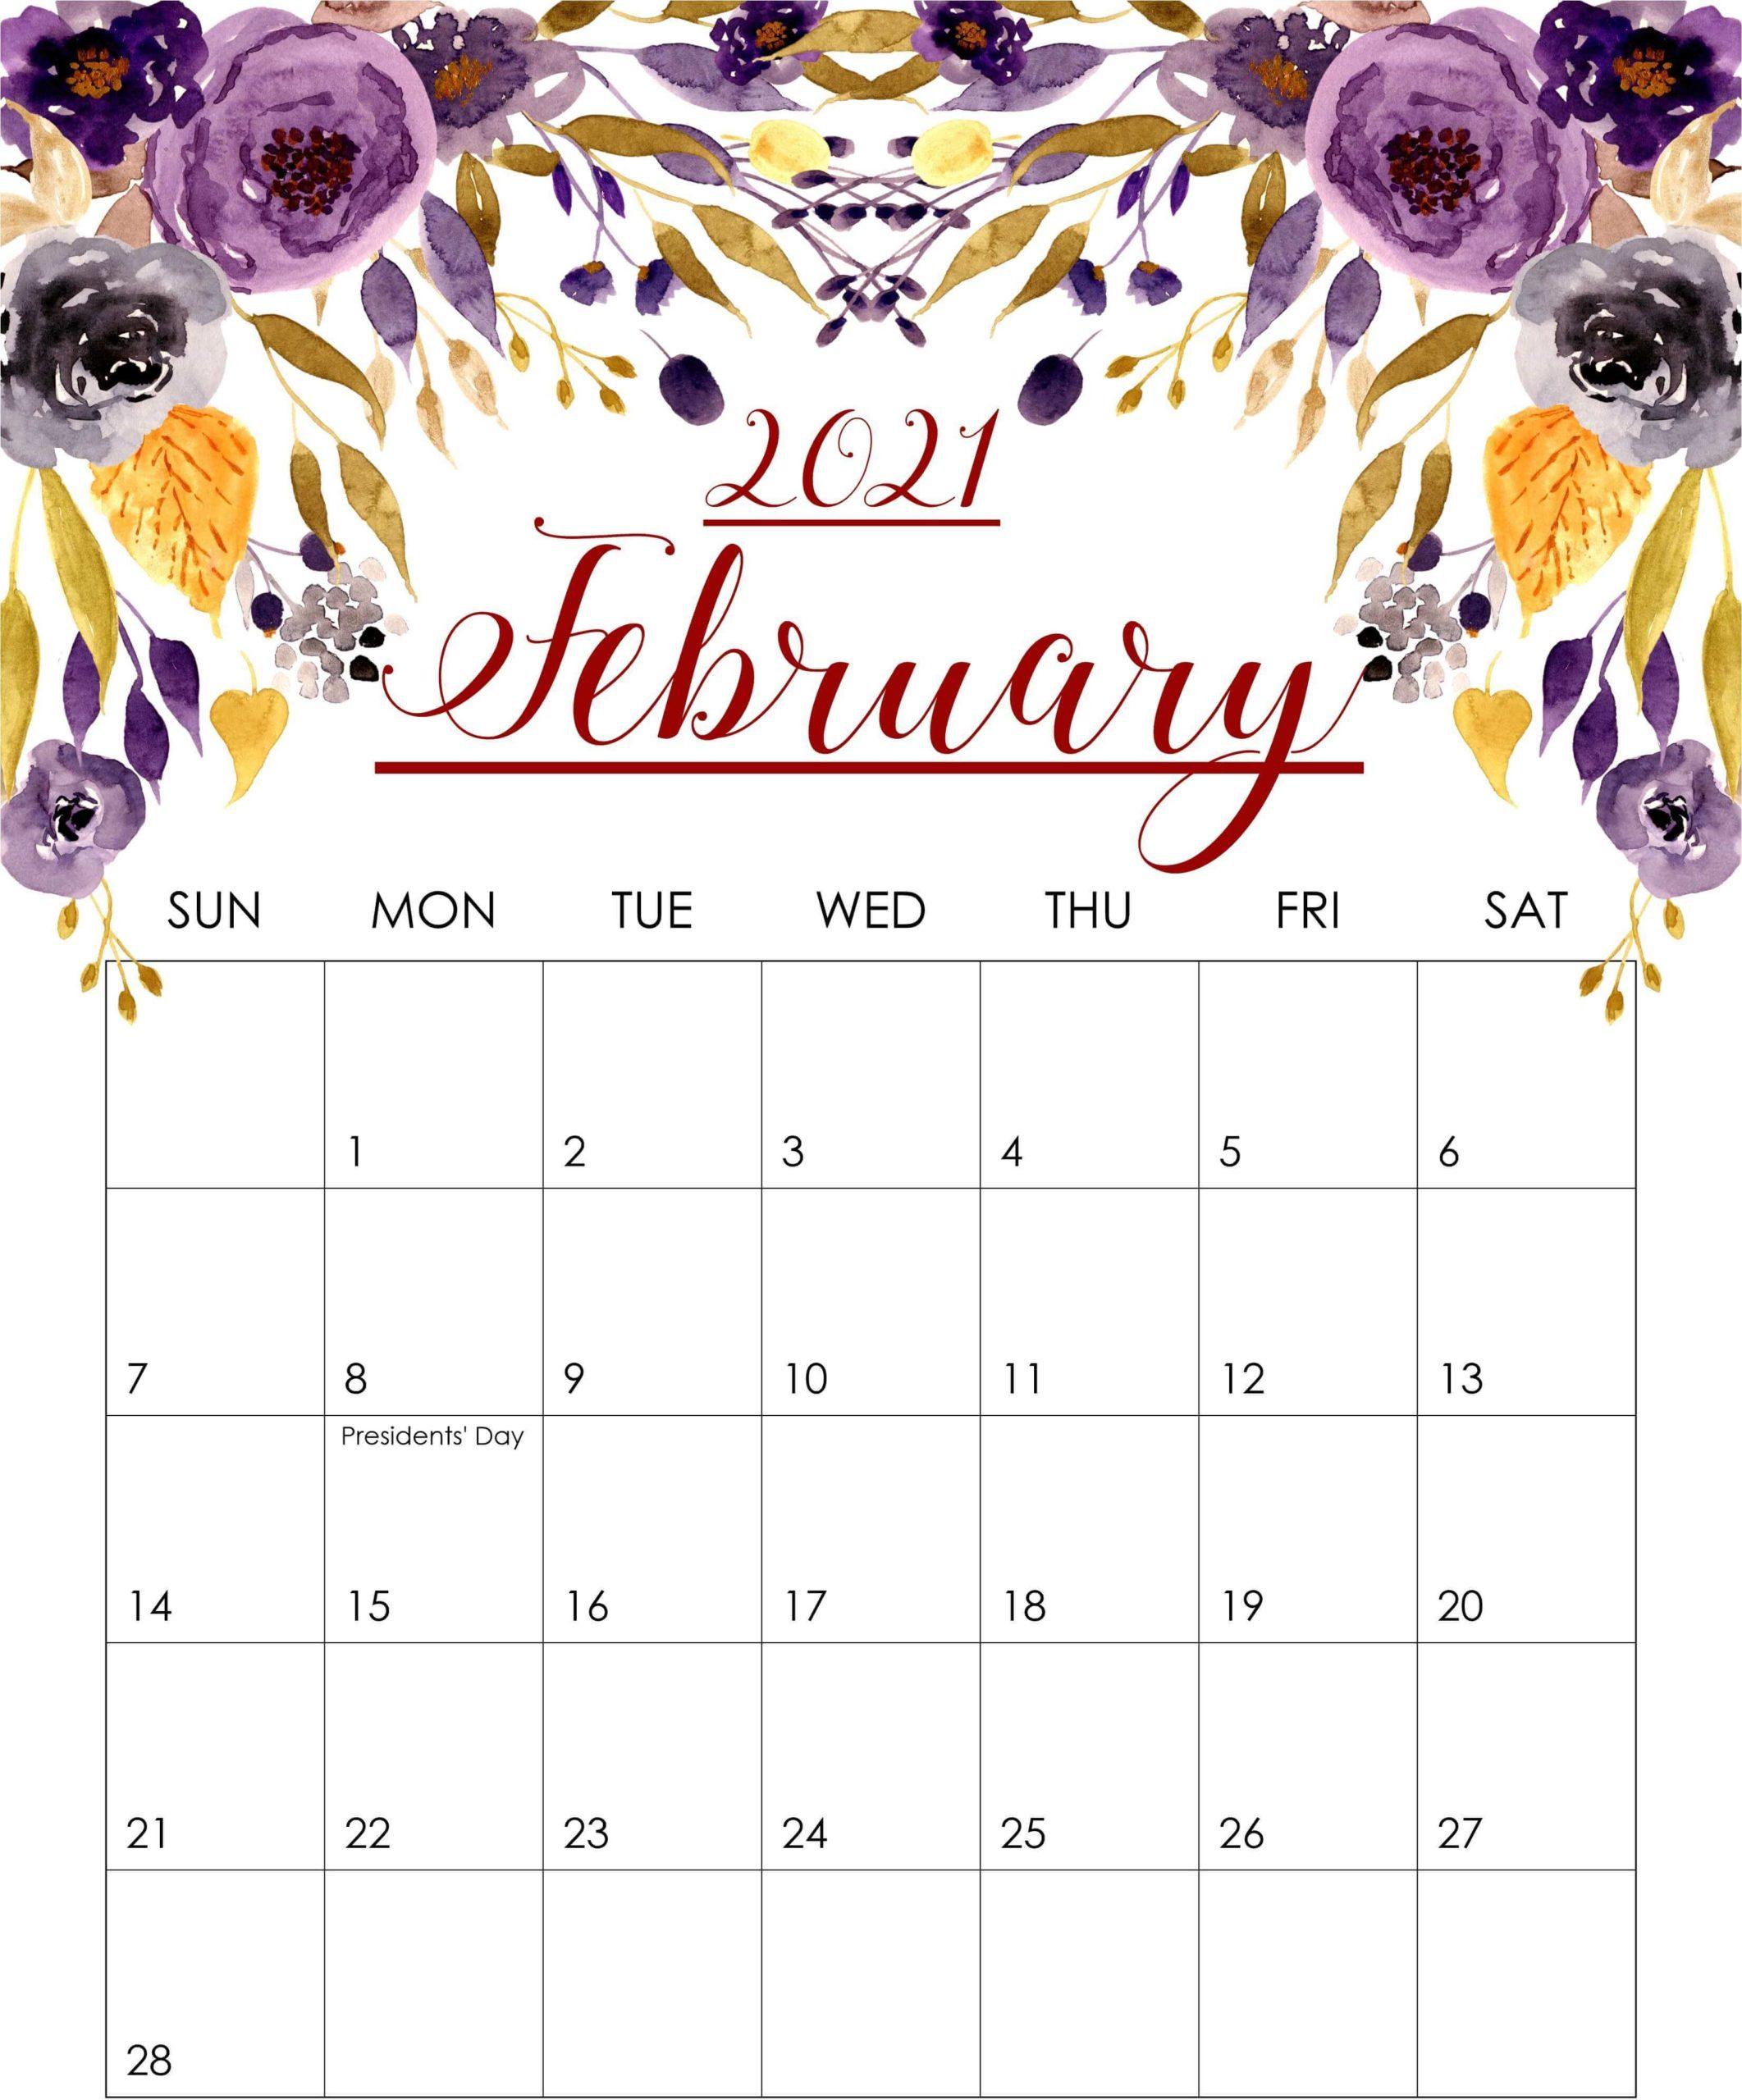 Decorative February 2021 Calendar Floral